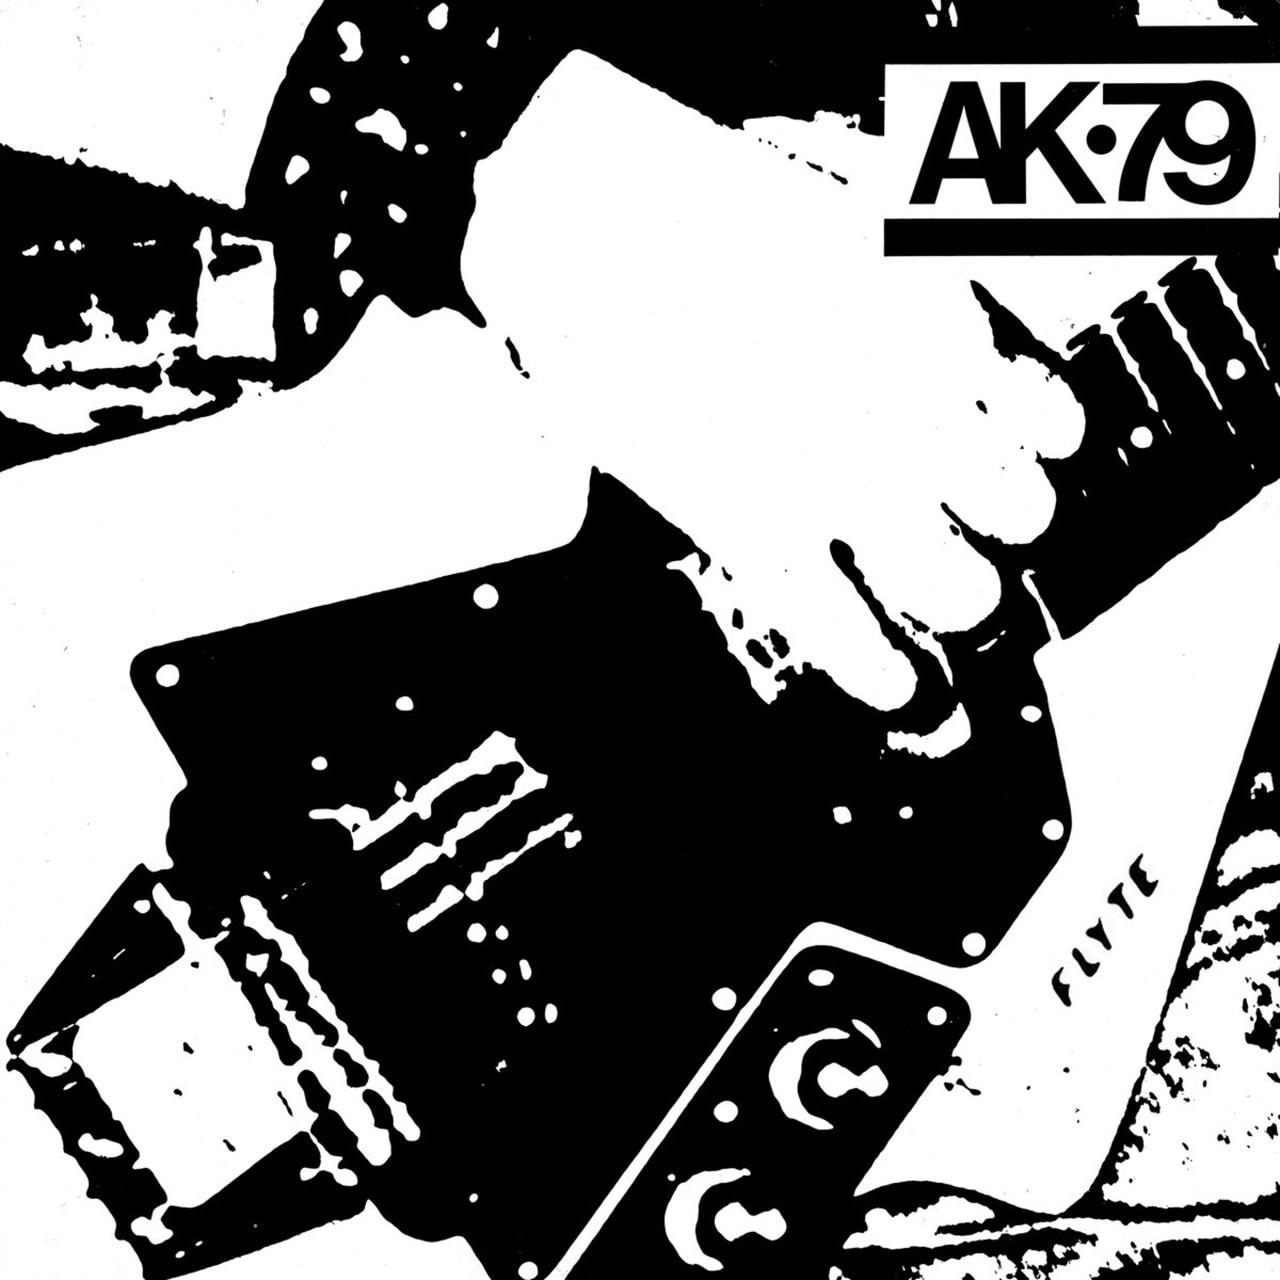 AK79 - 1